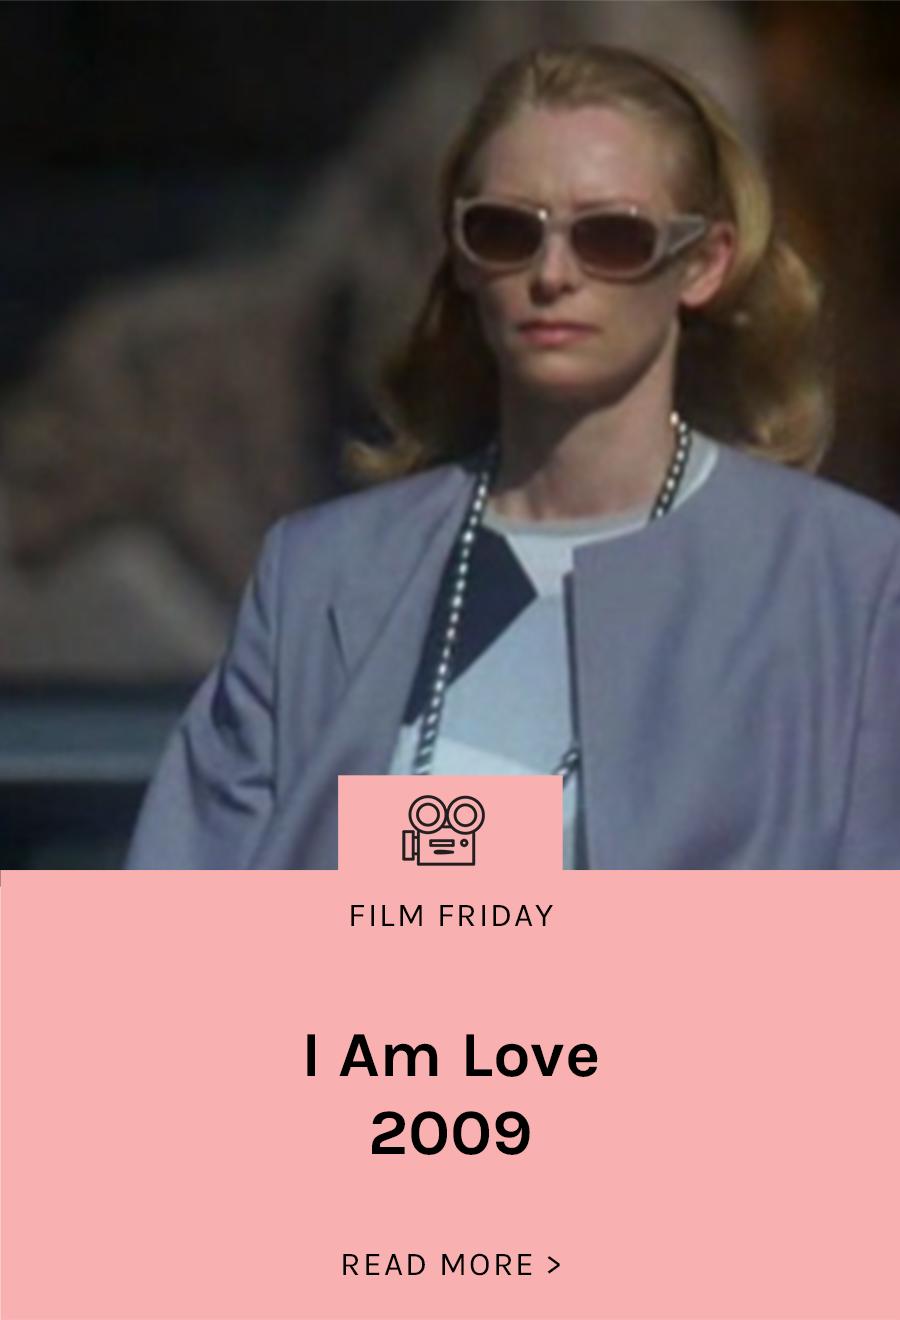 FILM_FRIDAY_I_am_love_1999_landing.png